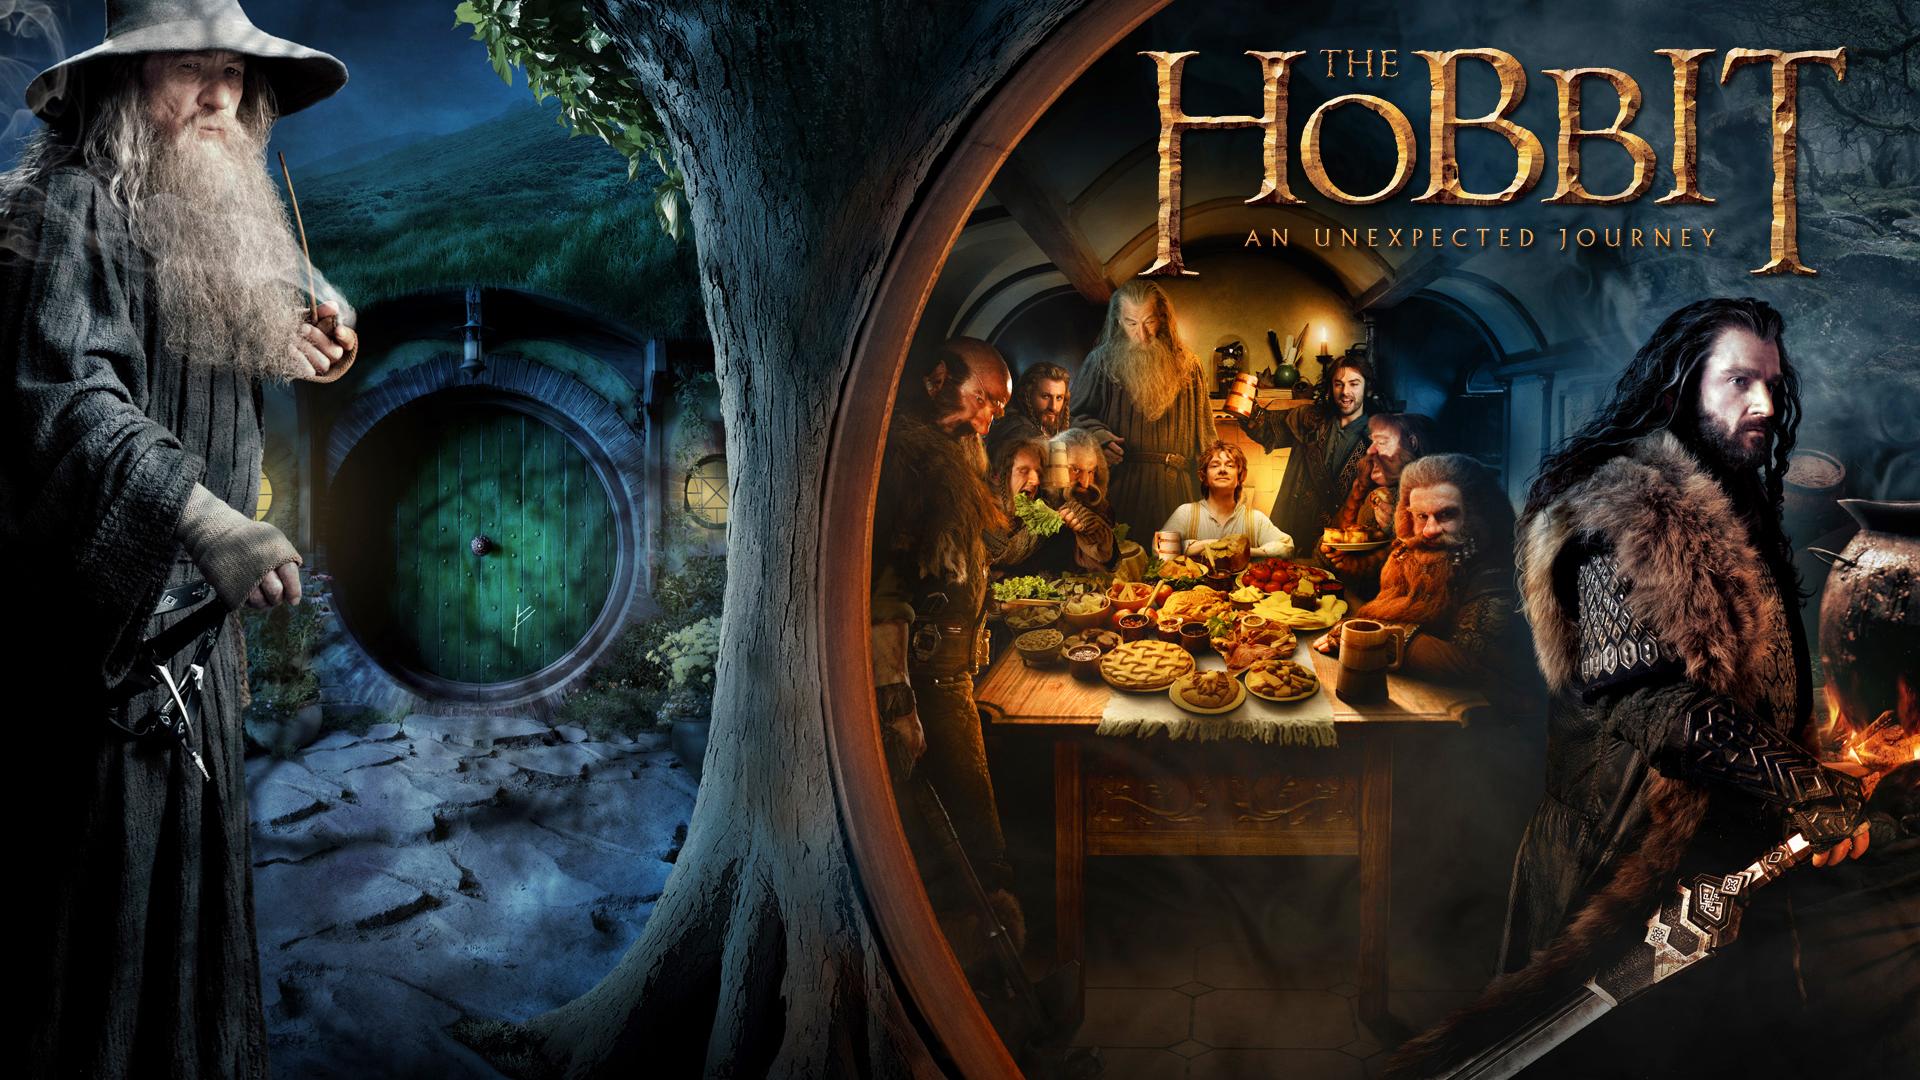 The Hobbit An Unexpected Journey Dwarves HD desktop wallpaper